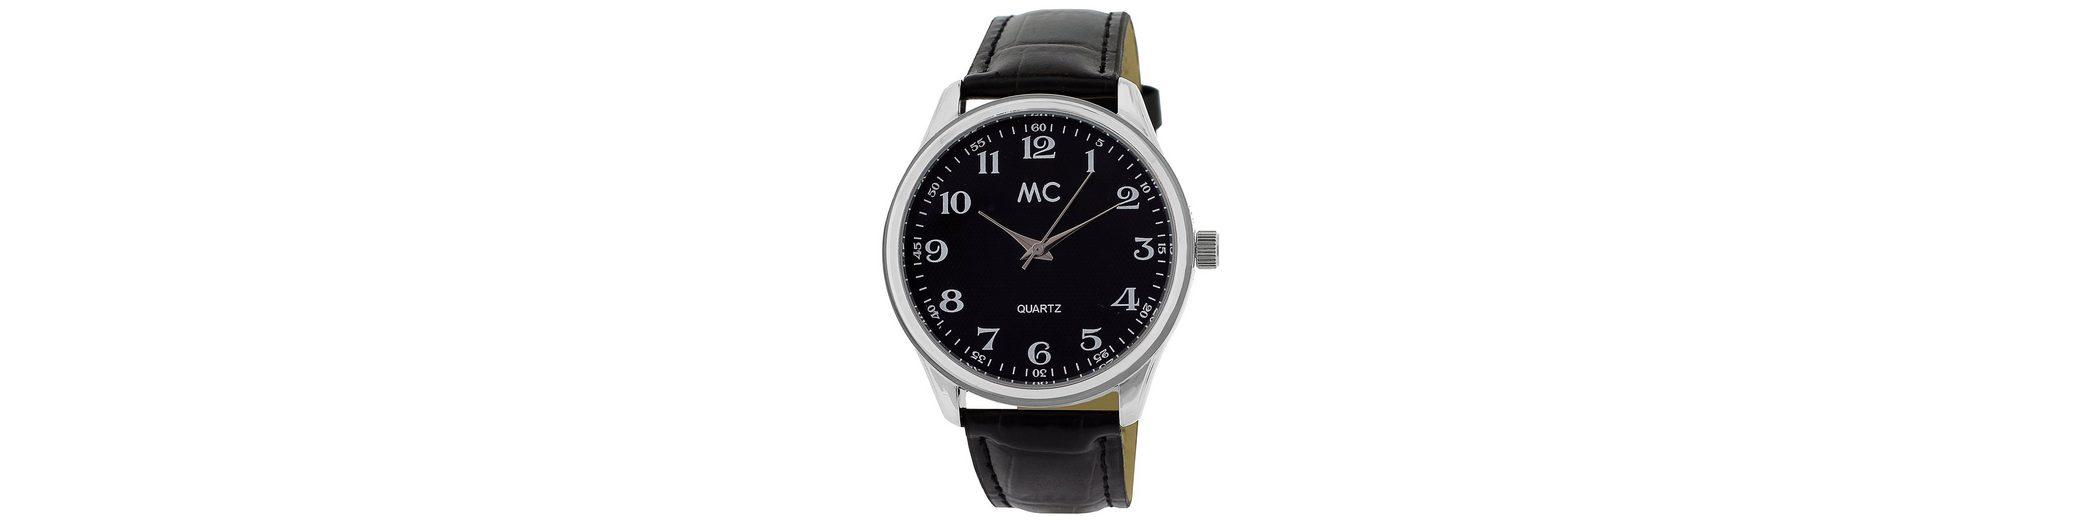 "MC, Armbanduhr, ""27657"""